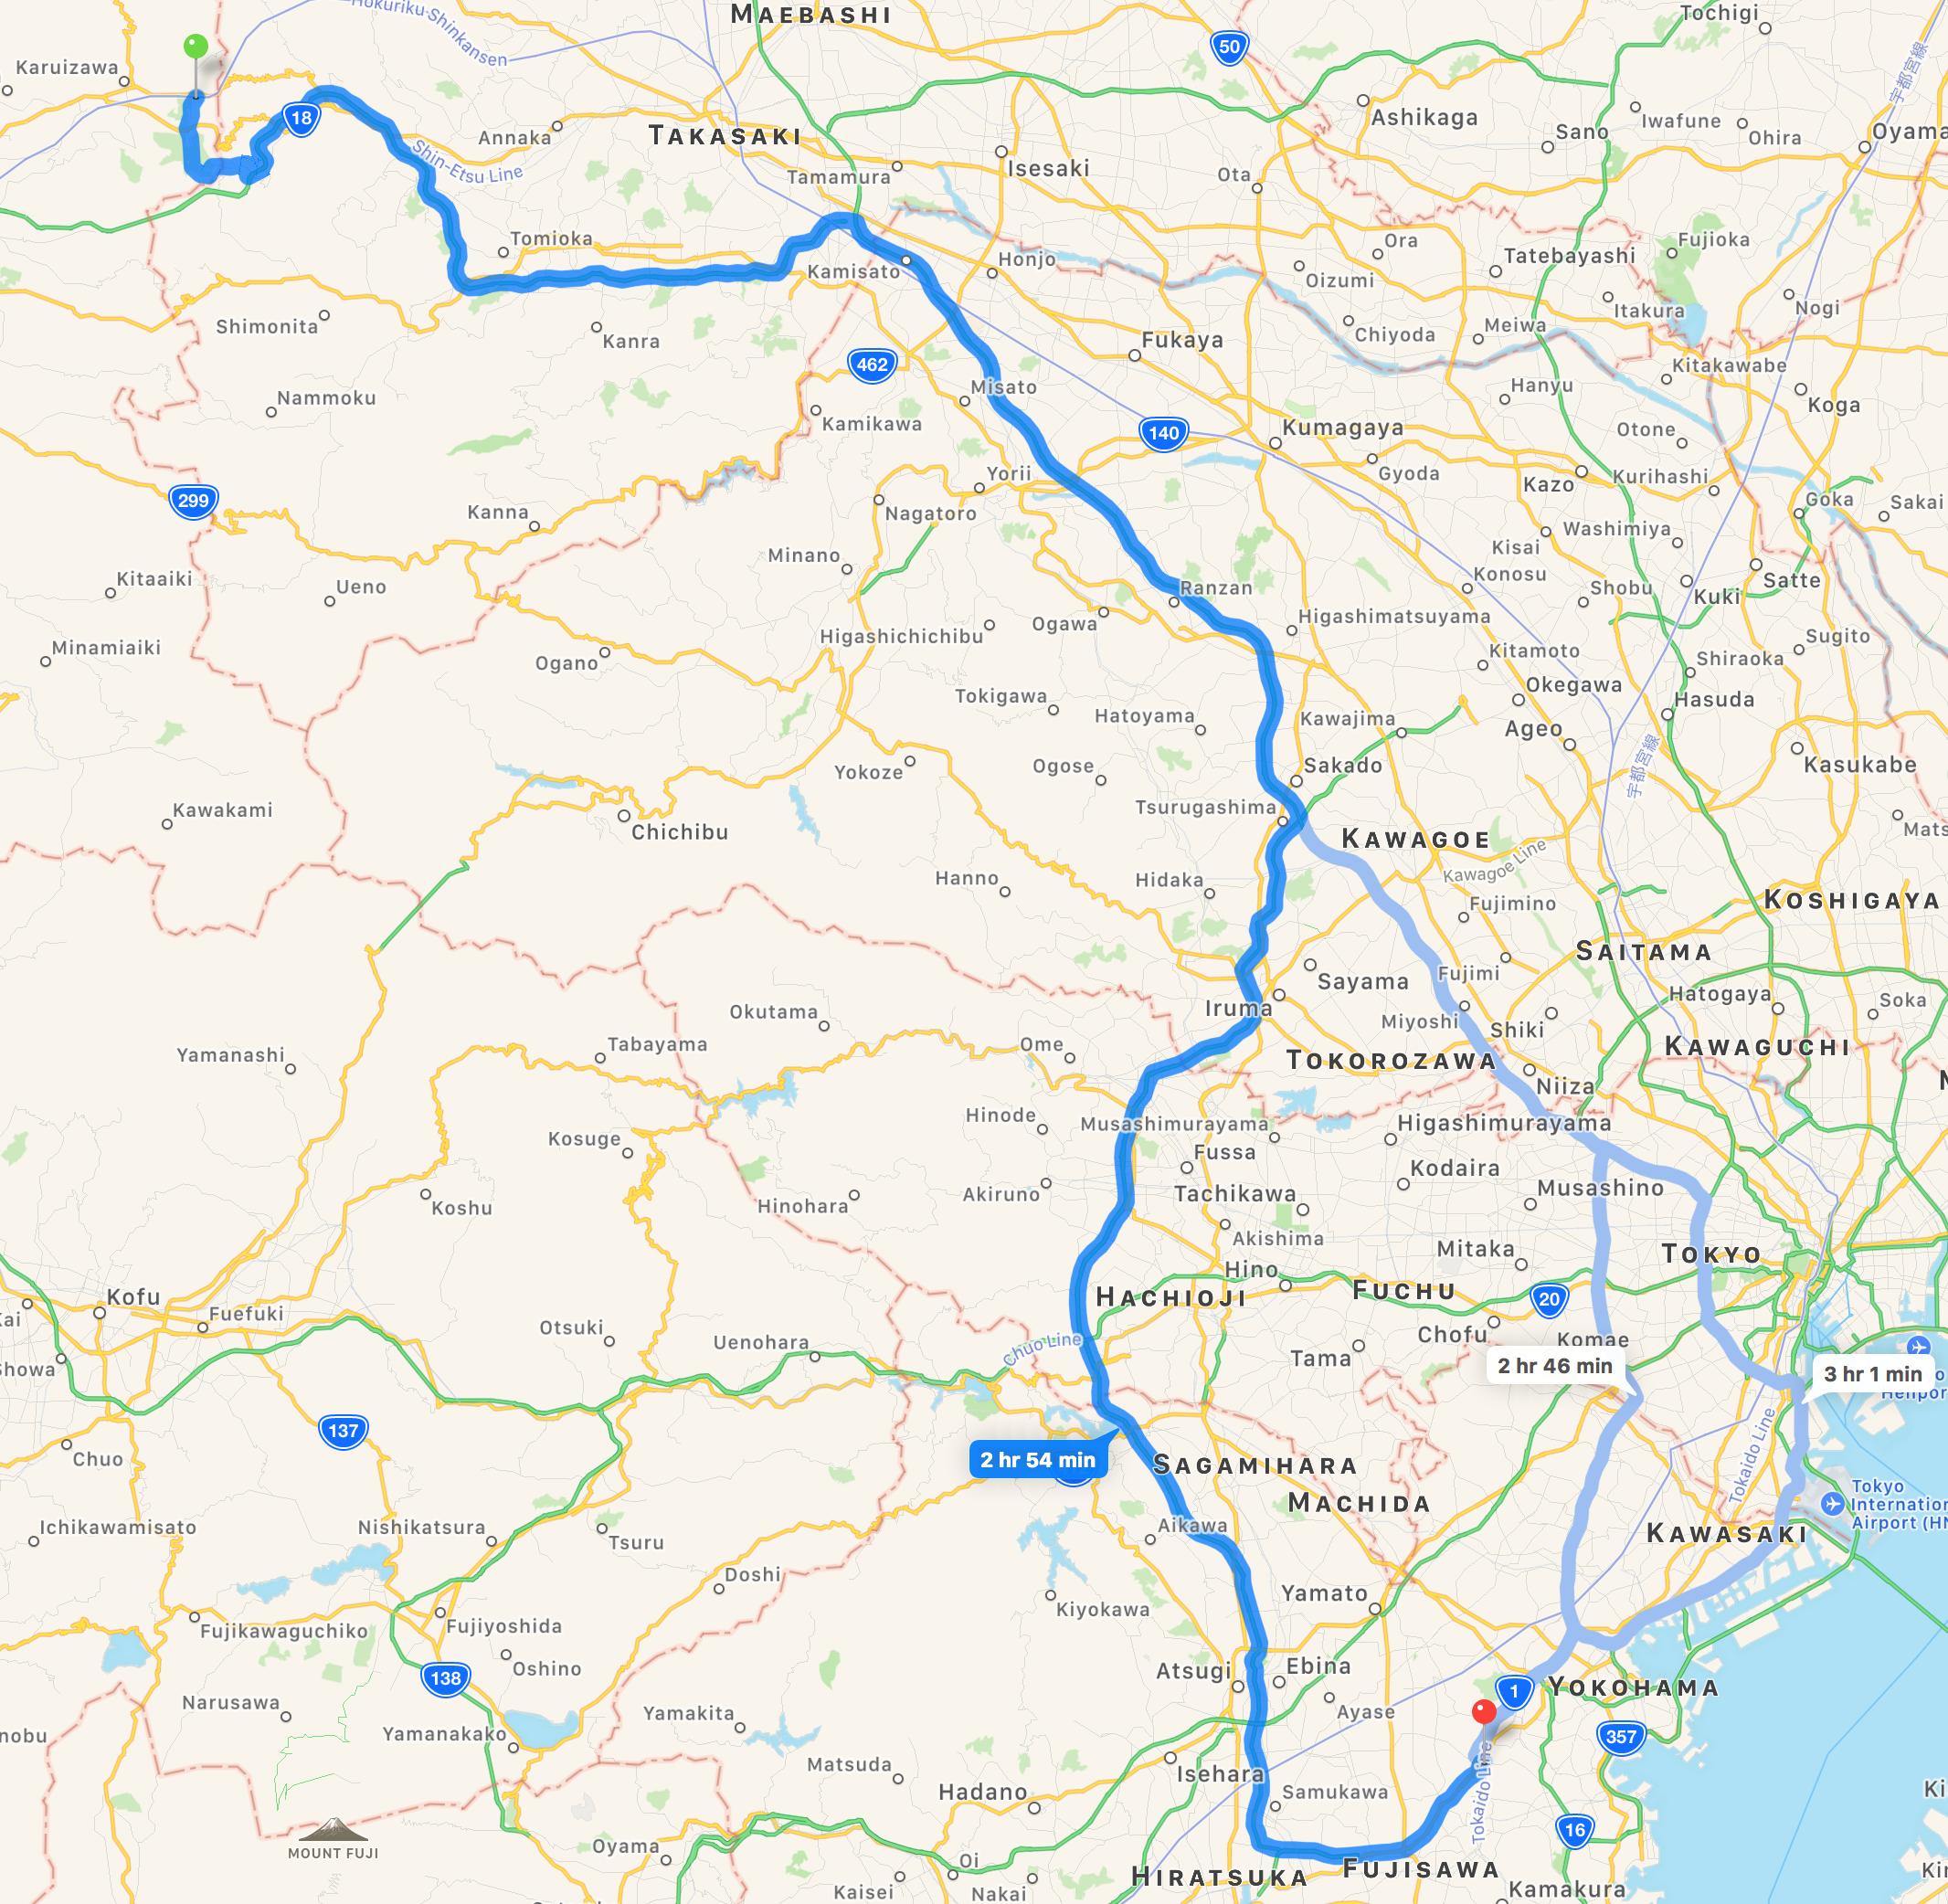 The route from Karuizawa to Totsuka, Yokohama, Kanazawa prefecture